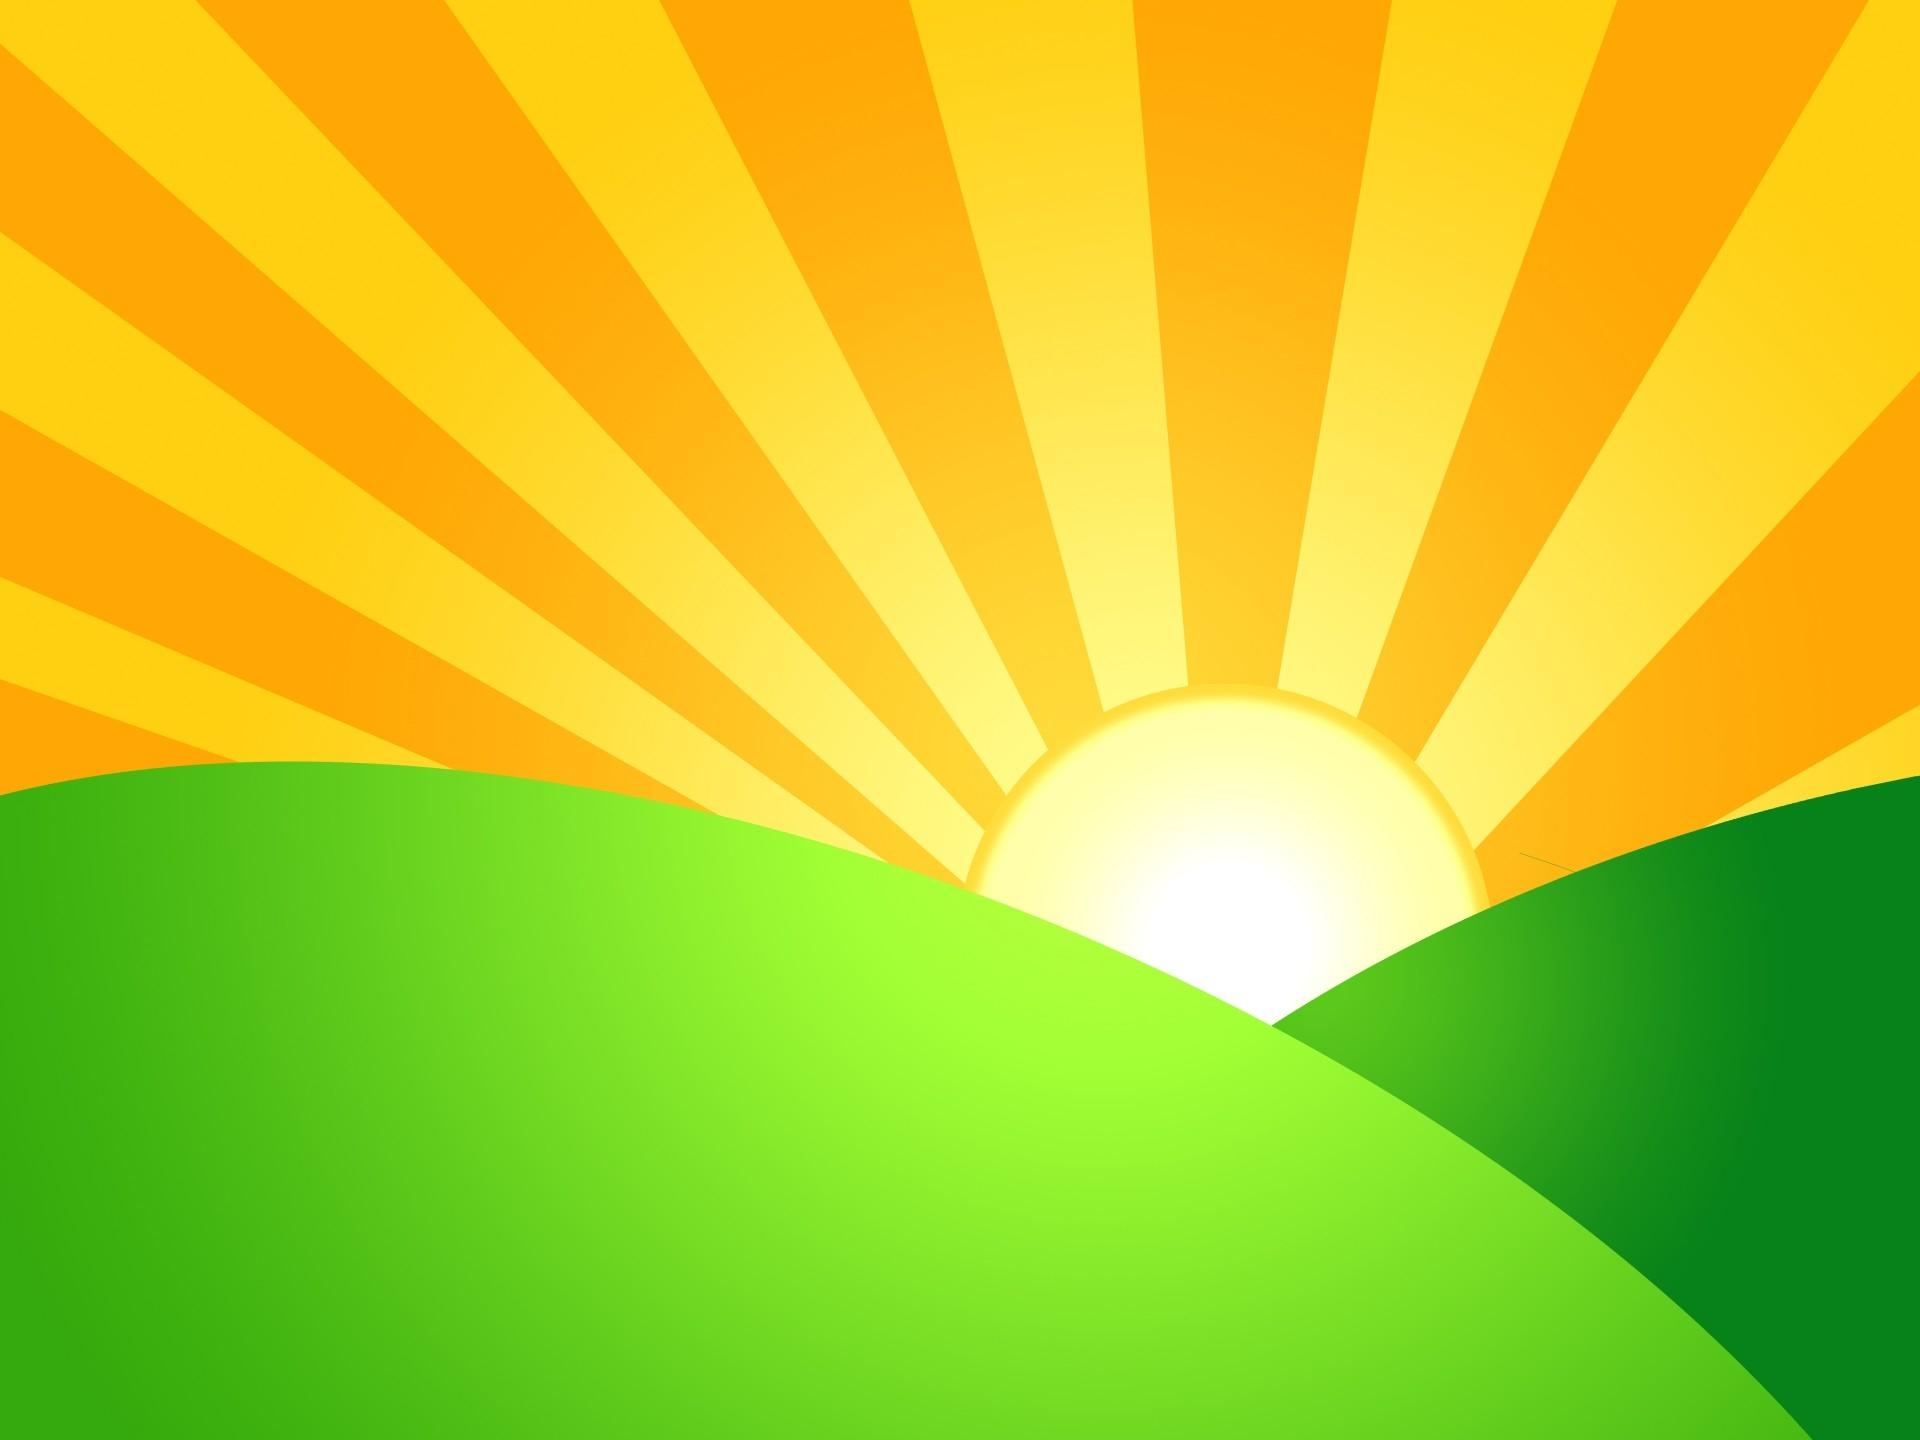 Sun Rising Clipart.